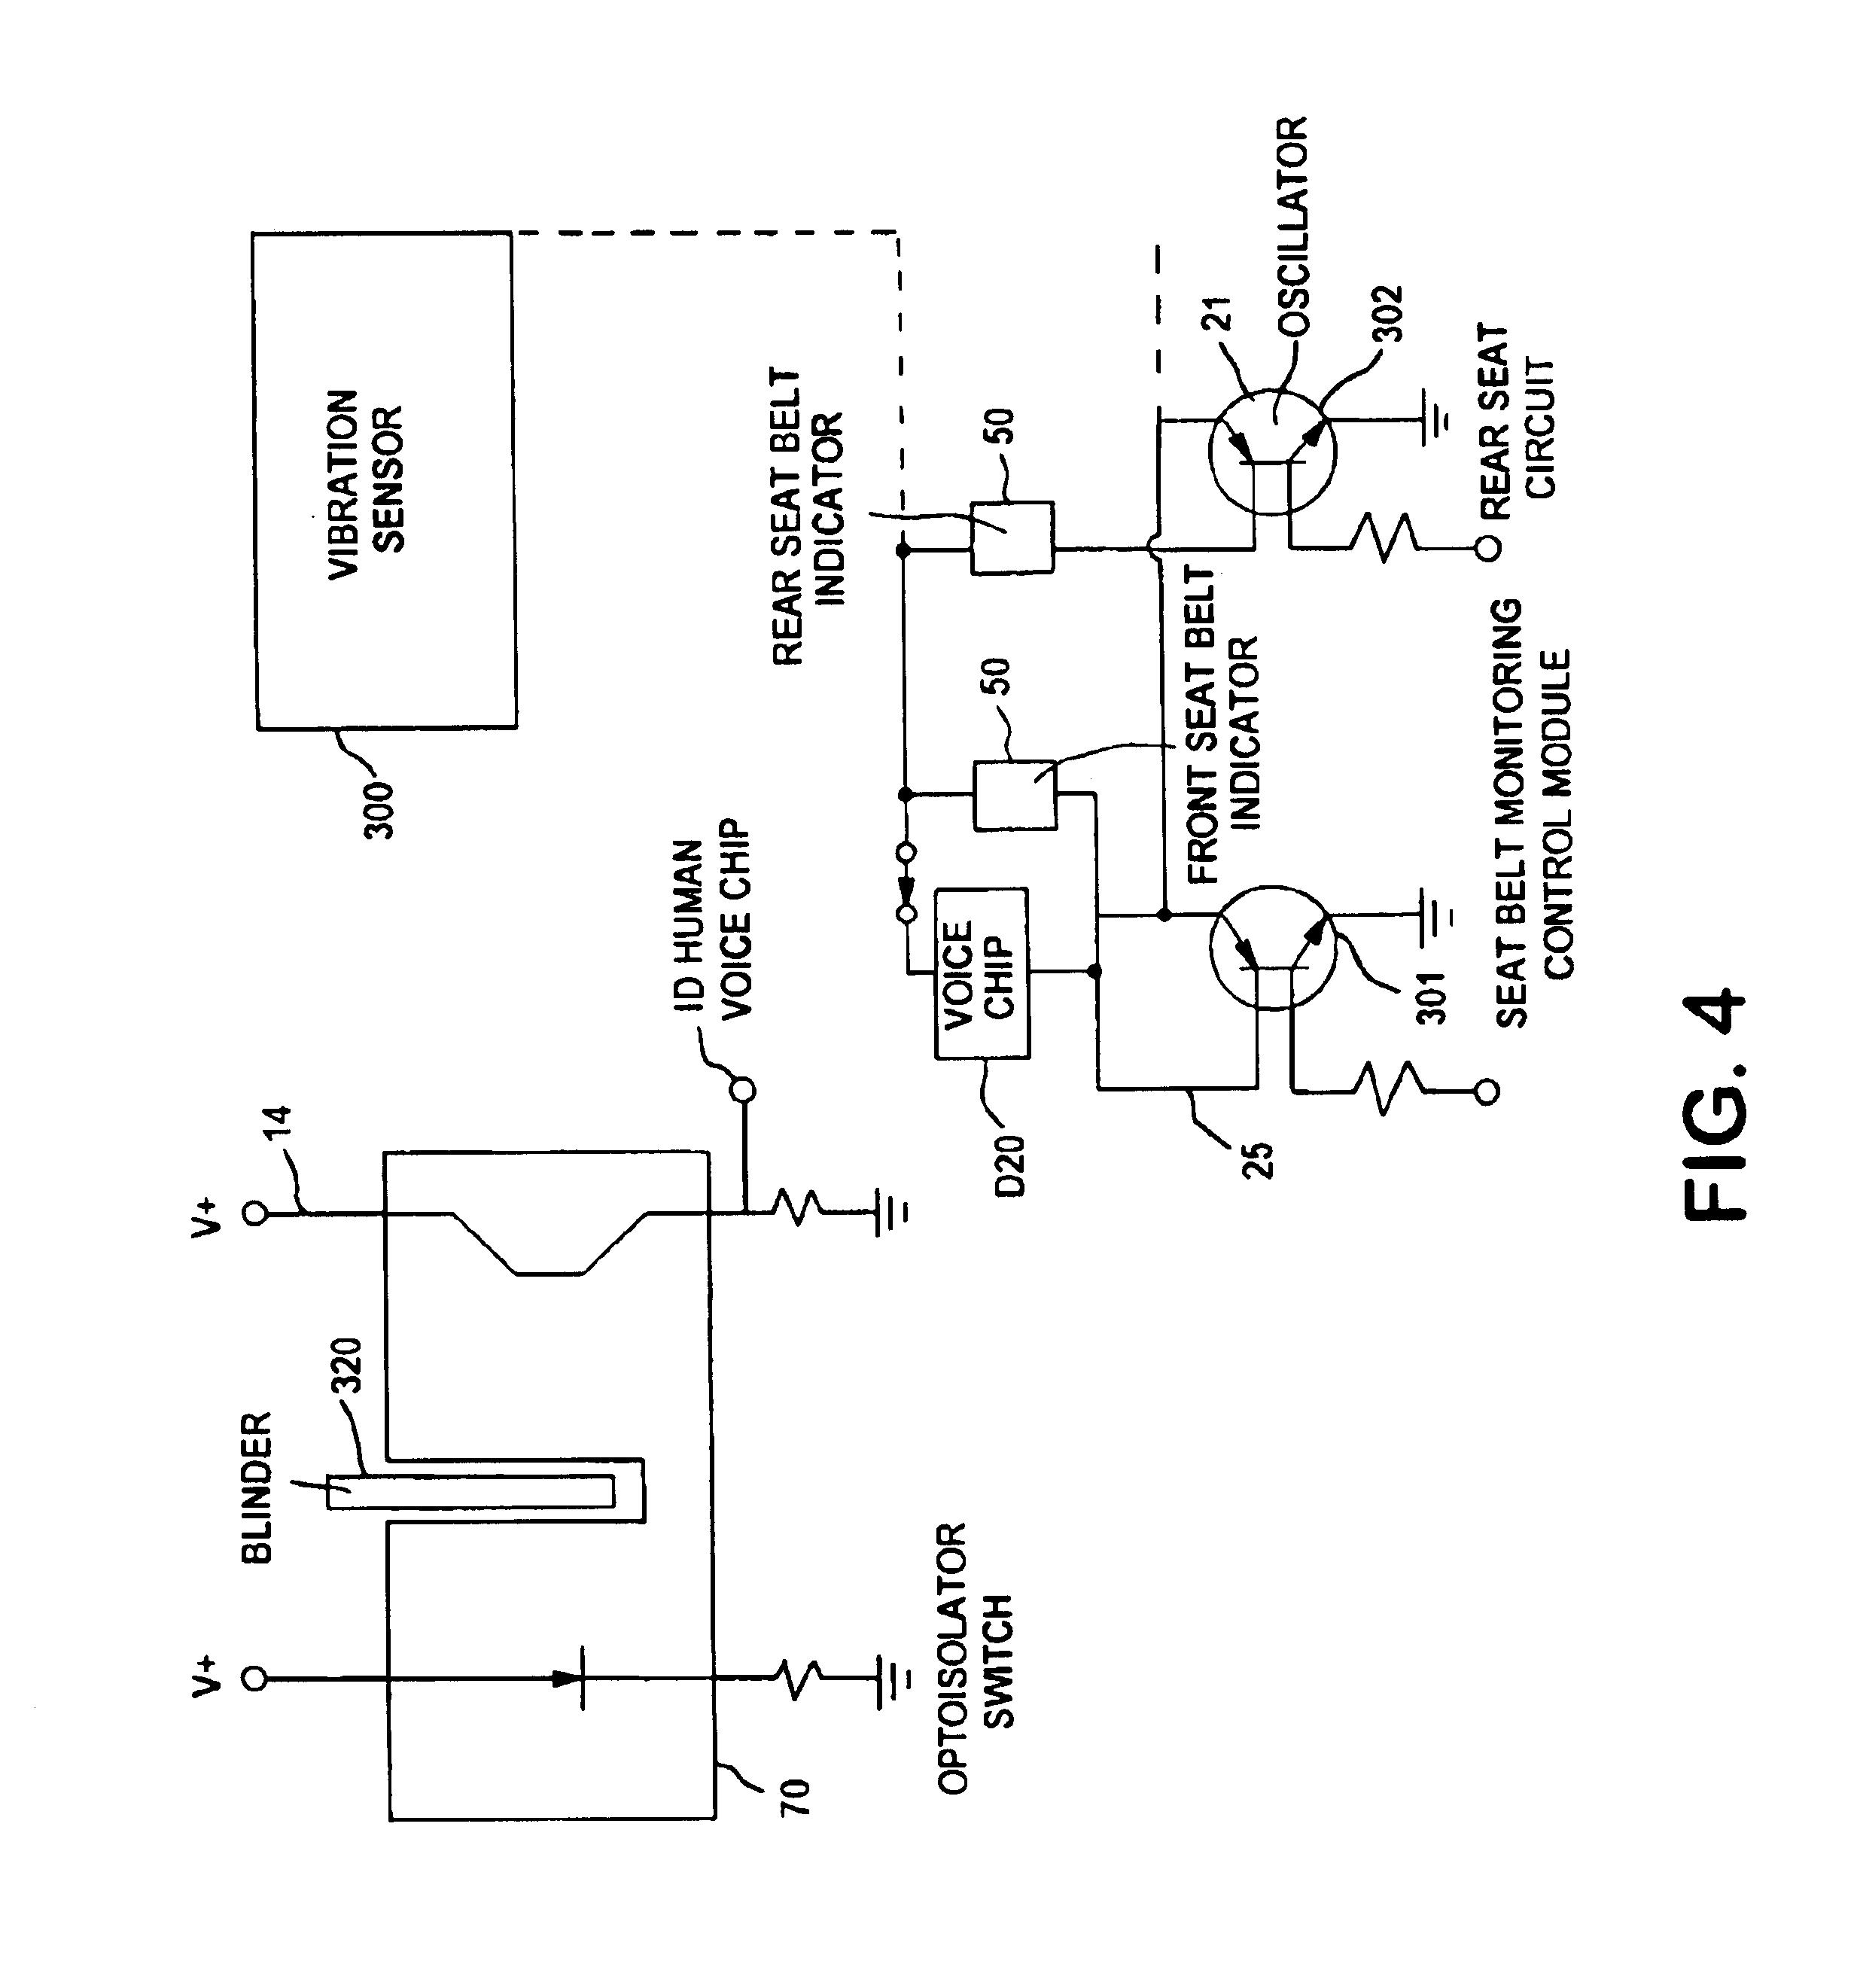 patent us6728616 - smart seatbelt control system